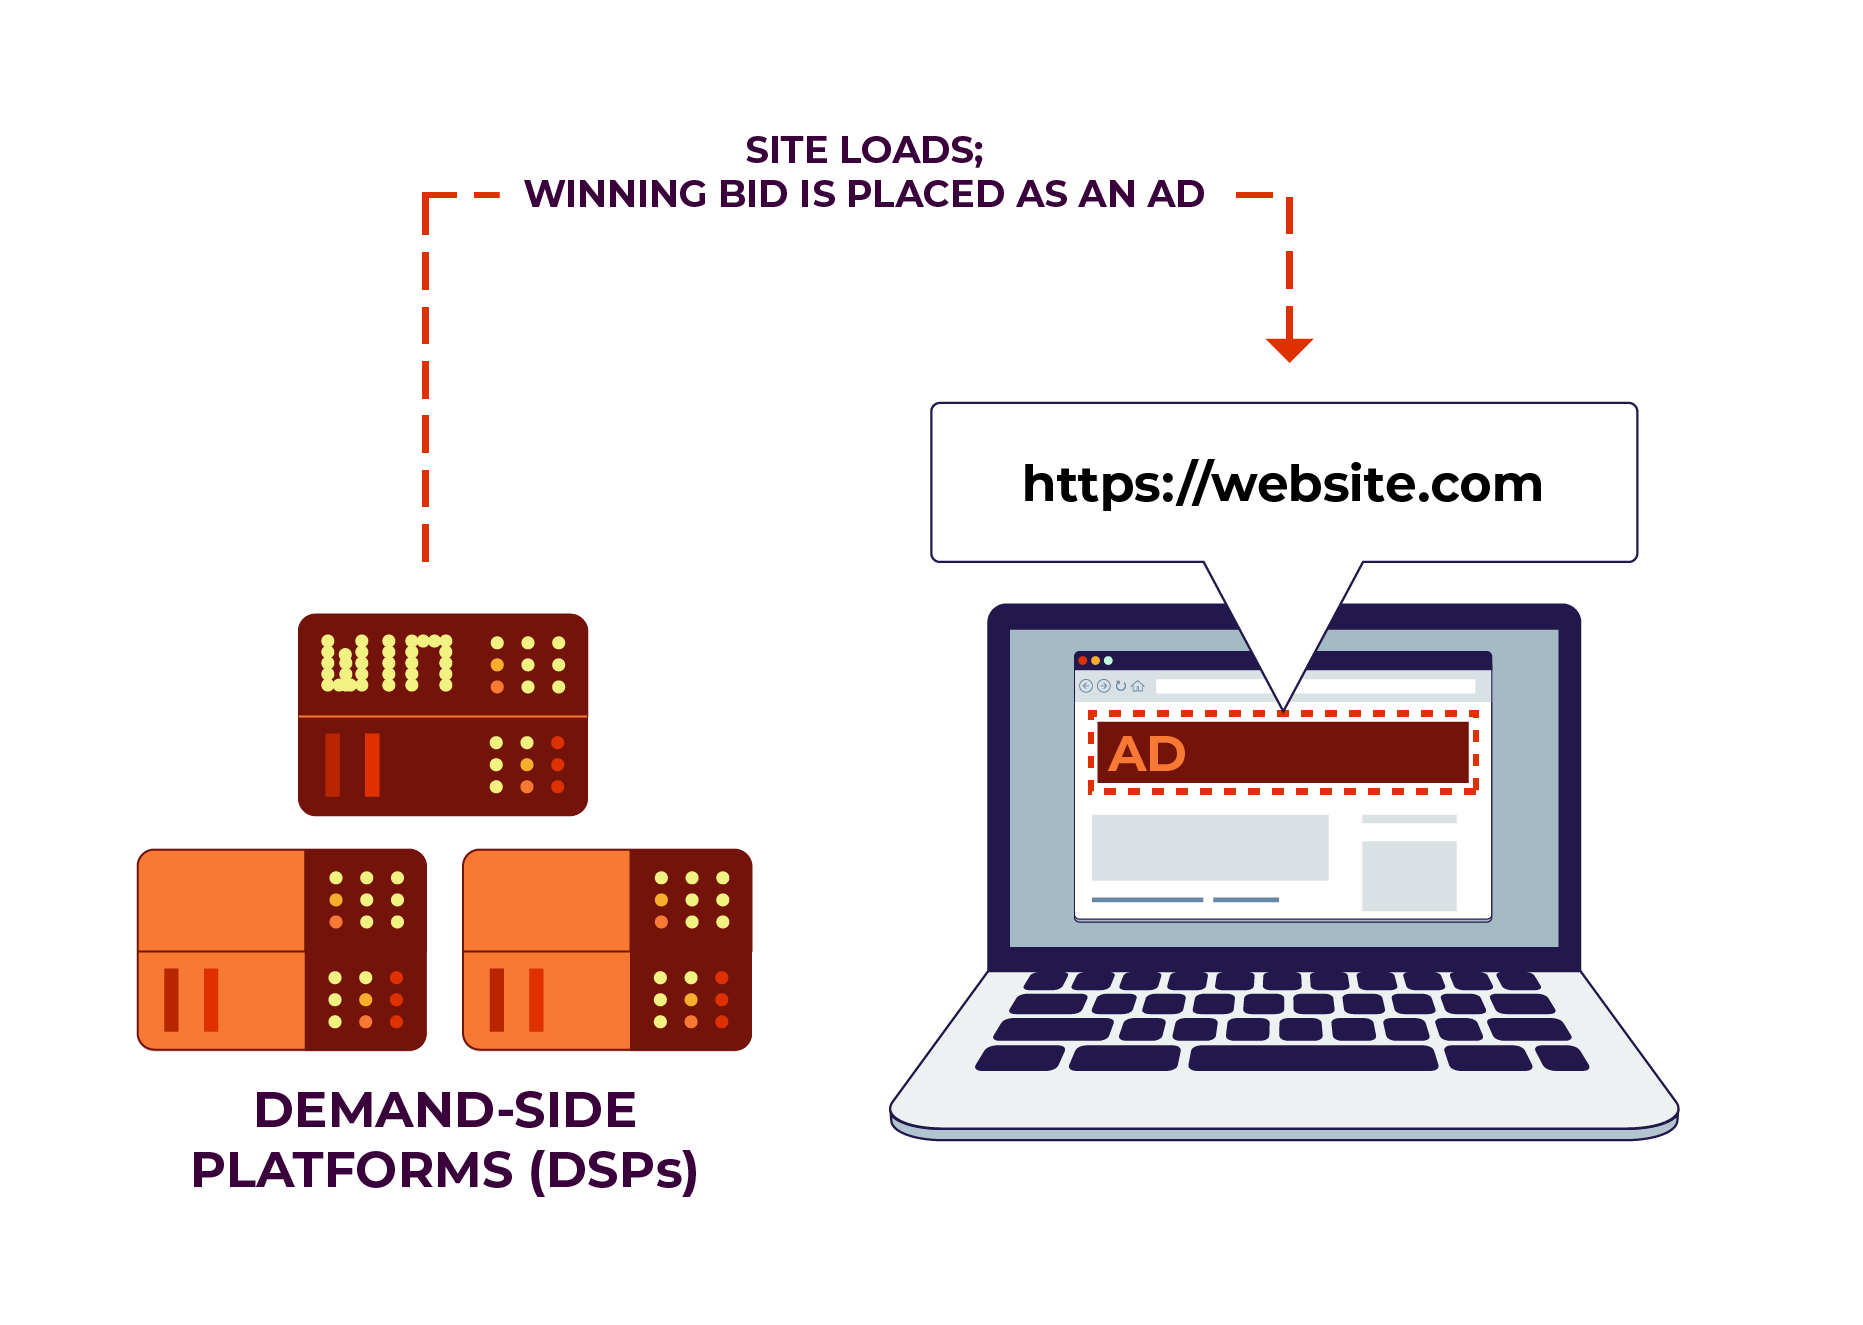 A demand-side platform server winning the bid.